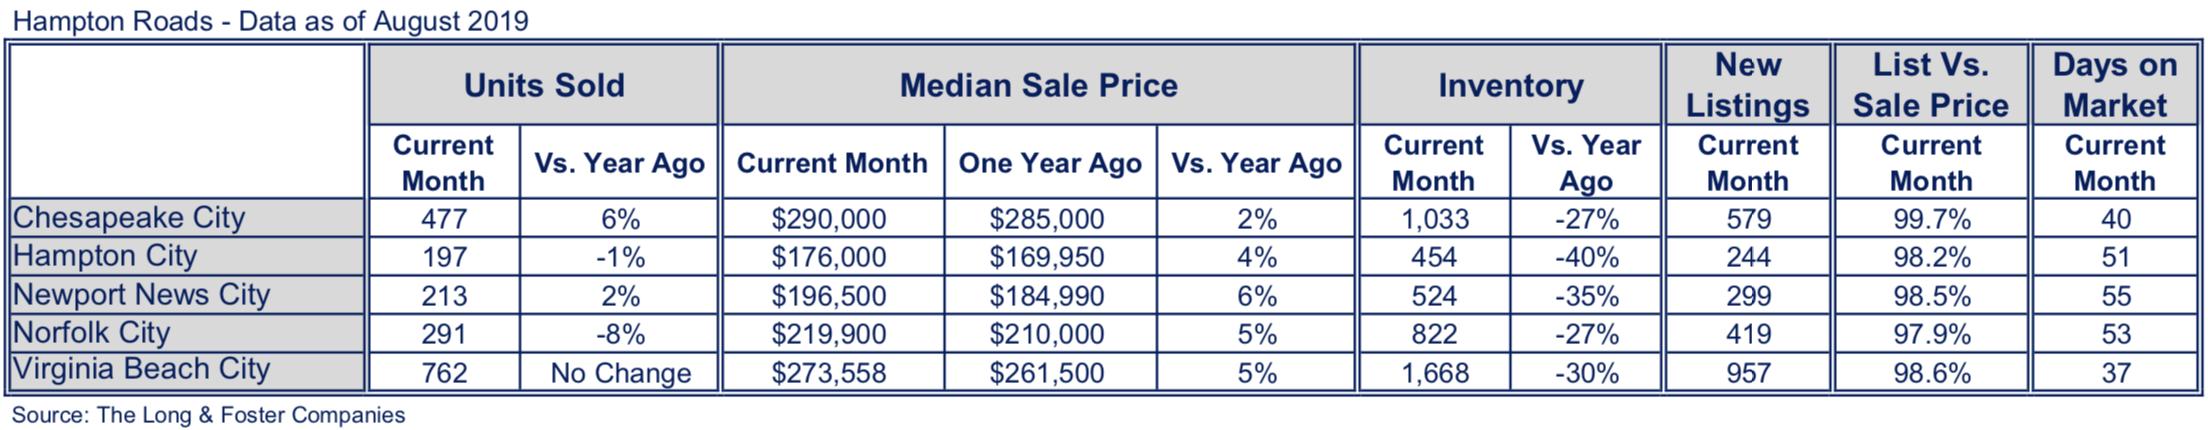 Hampton Roads Market Minute Chart August 2019